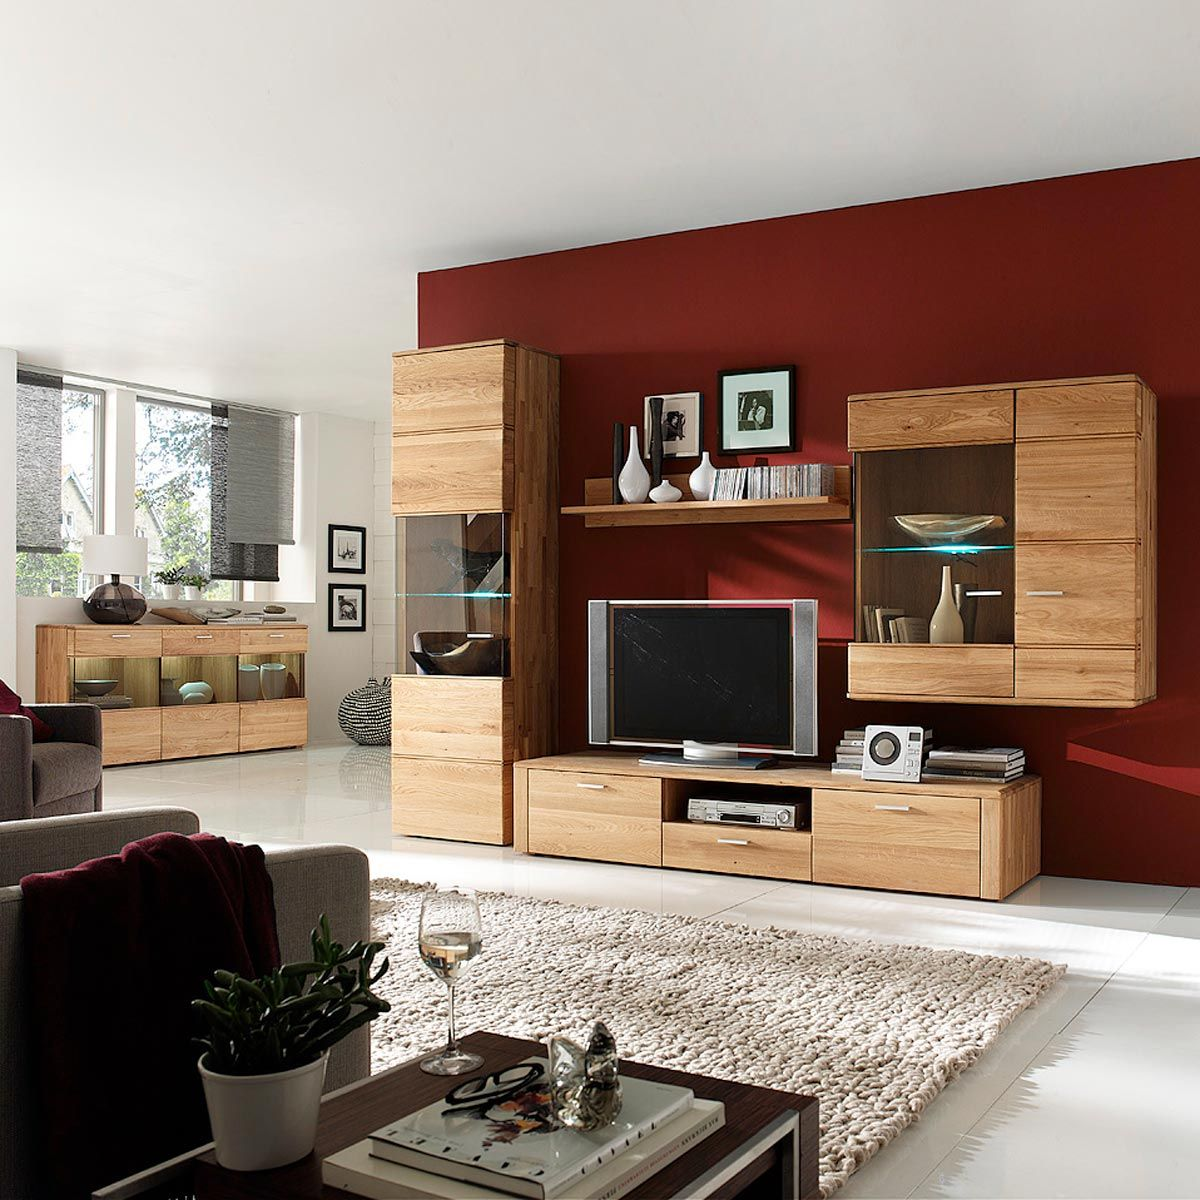 Massivholz Möbel Online Kaufen MÖbel Ideal Möbel Online Kaufen Möbel Wohnzimmer Online Möbel